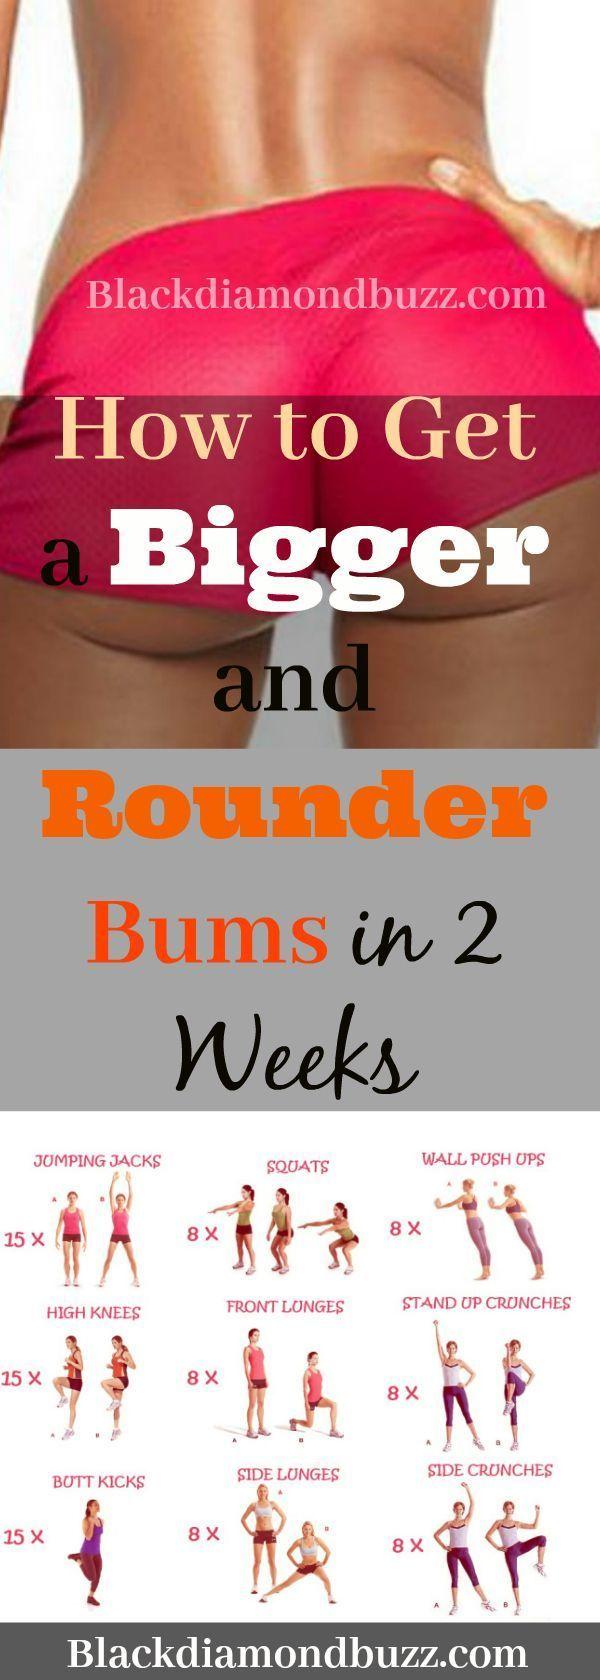 548db25f6e76478d9b493fcbfc2c6611 - How To Get A Big Bum In Two Weeks